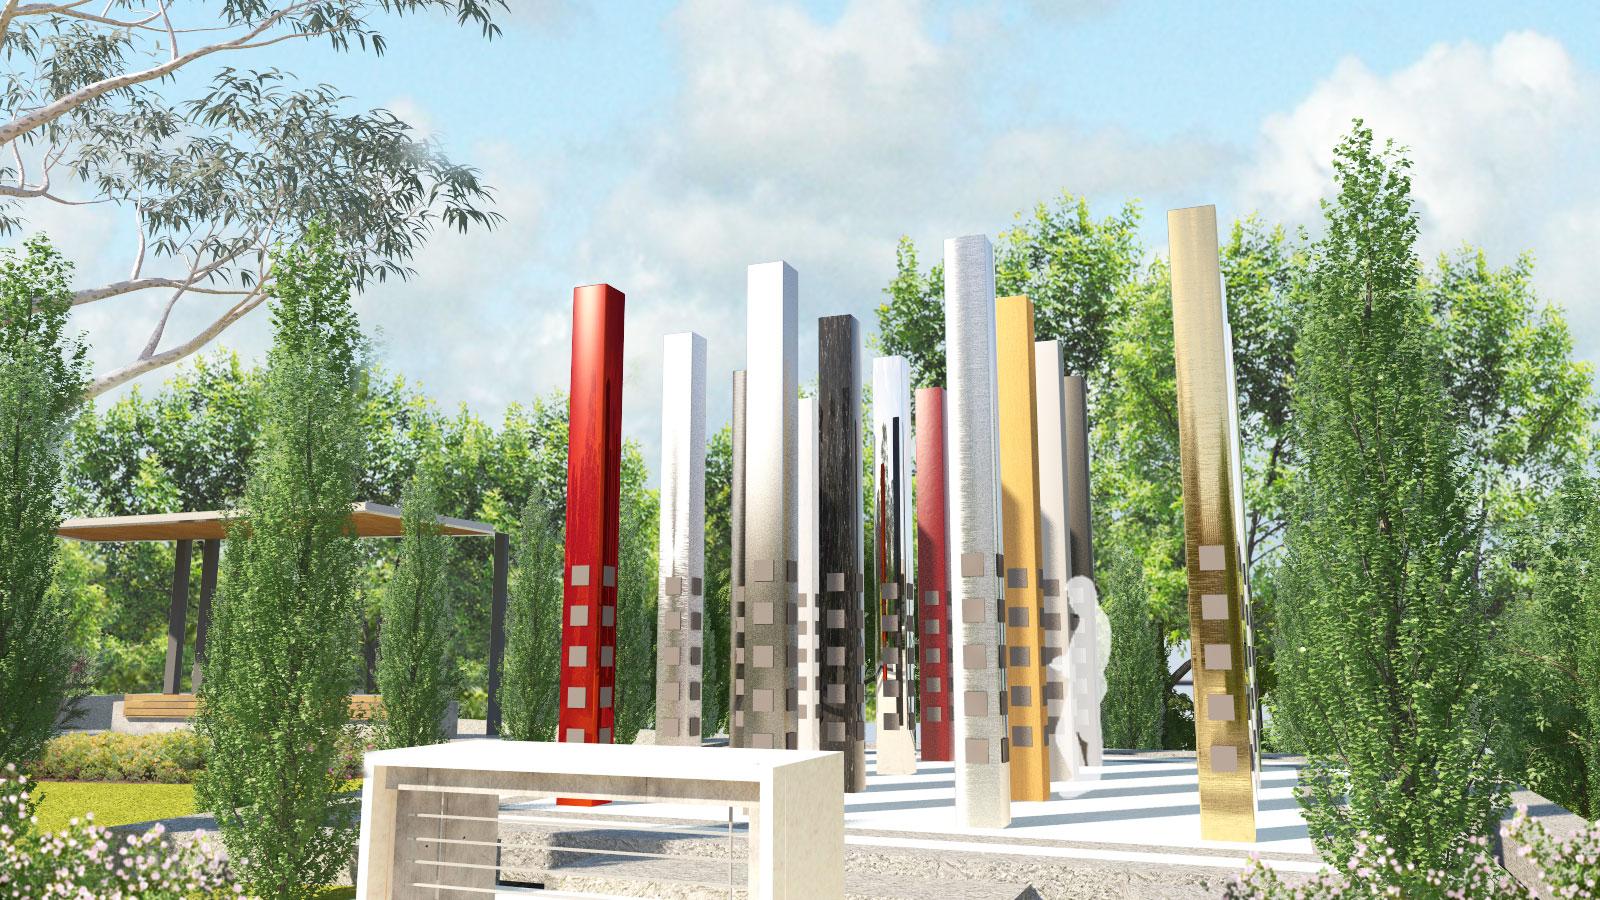 Sensory Gardens & Memorials Loss Souls Sculpture Architectural Render – Garnder Wetherill GW 2